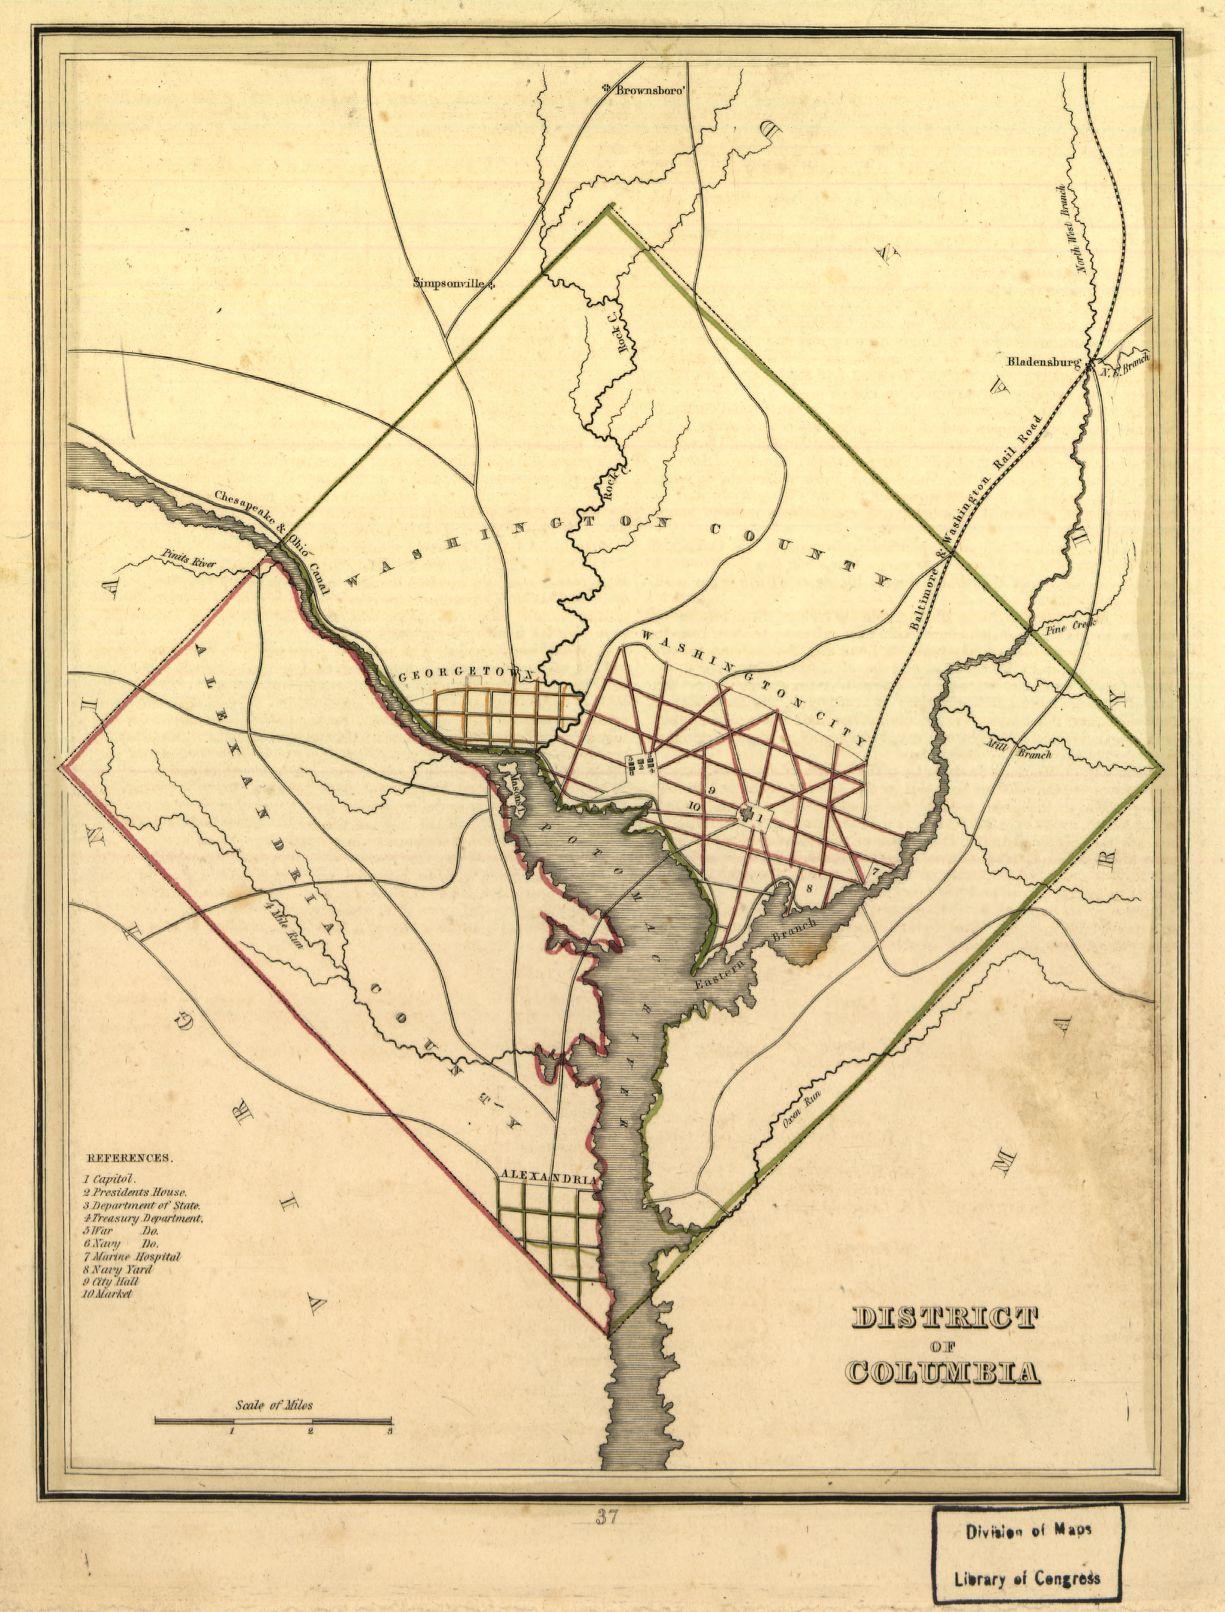 Washington County D C Wikipedia